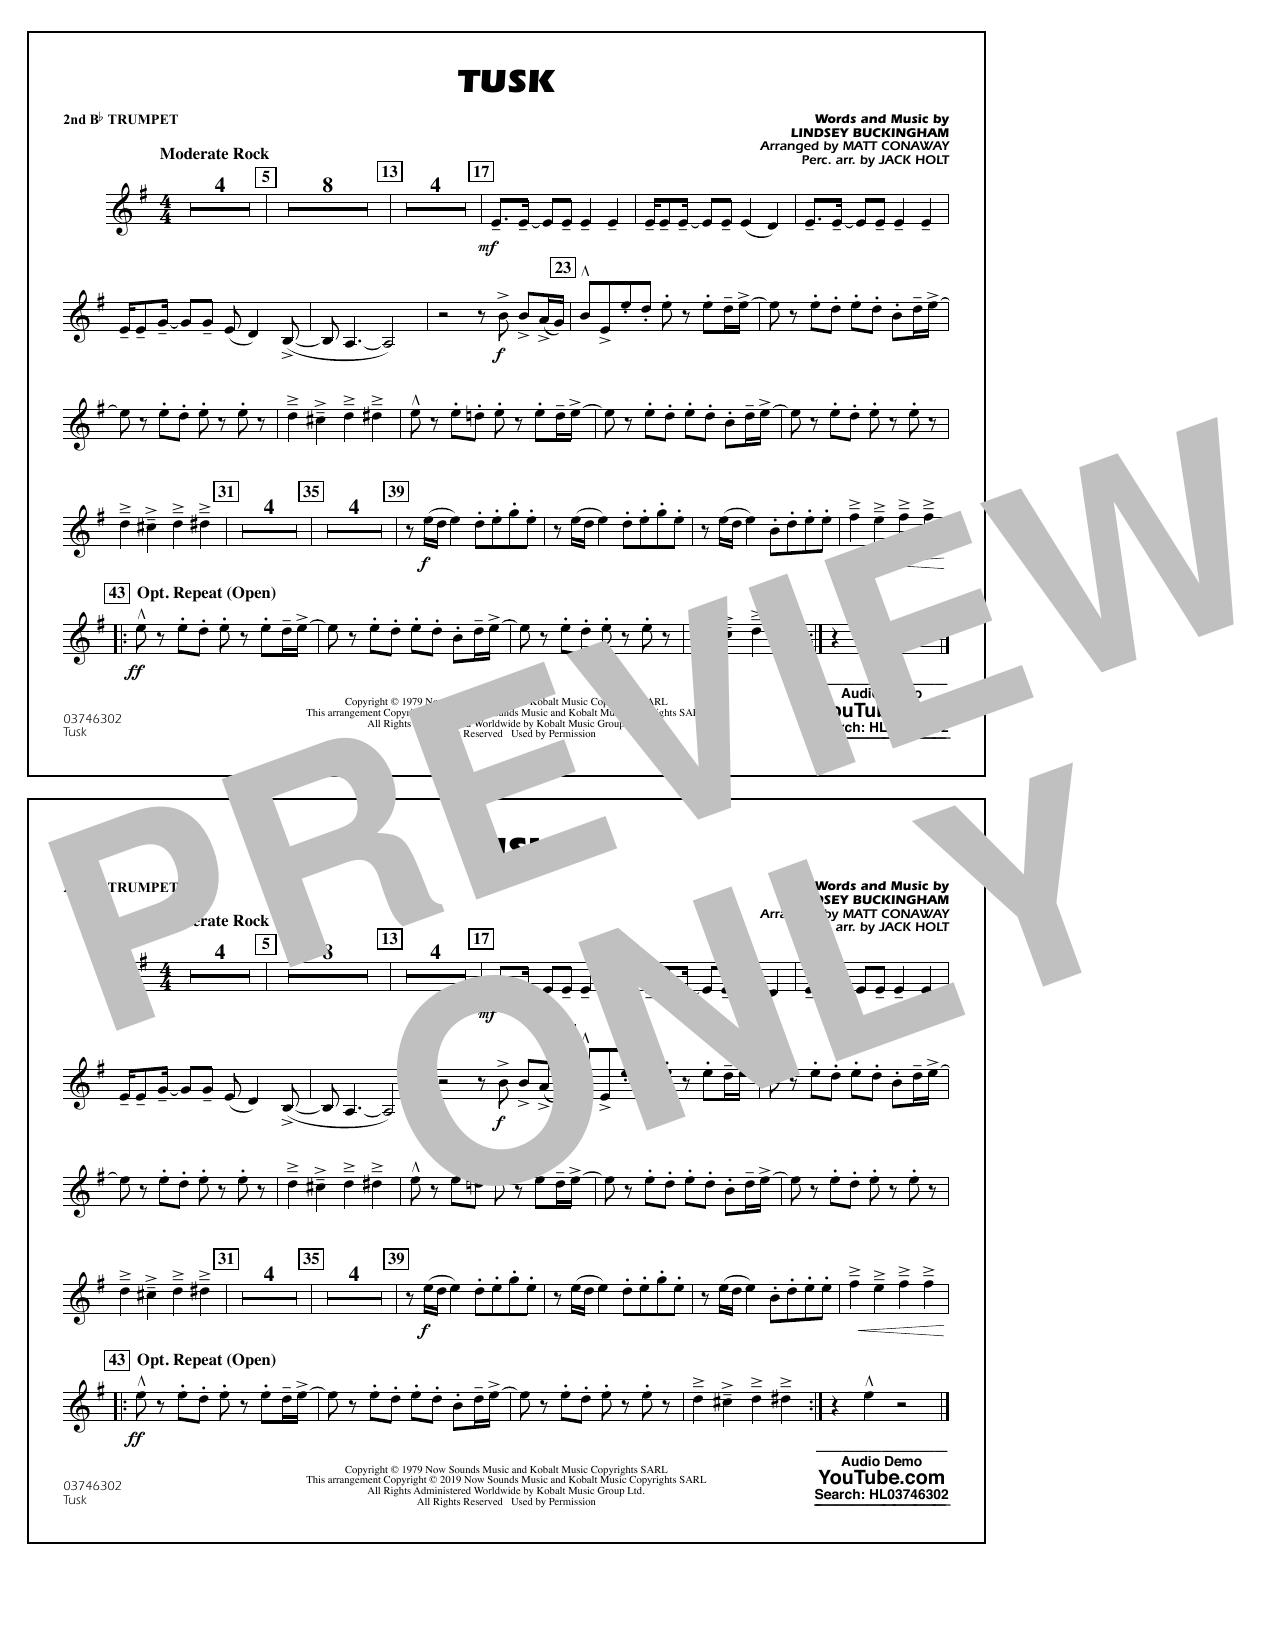 Fleetwood Mac Tusk (arr. Matt Conaway) - 2nd Bb Trumpet sheet music notes and chords